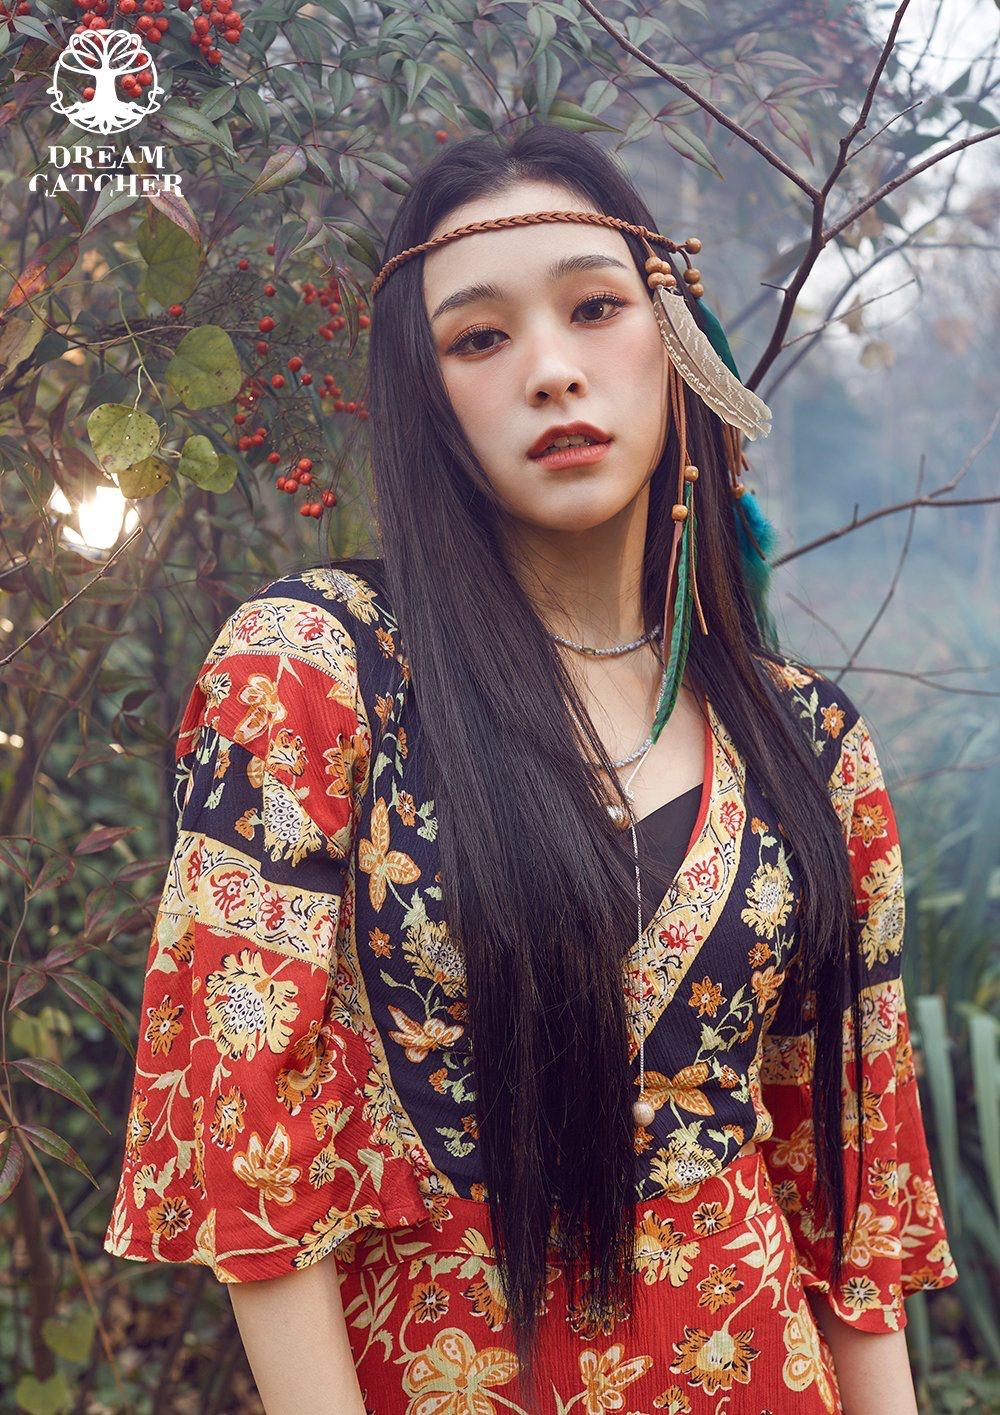 Dreamcatcher Gahyeon Dystopia The Tree Of Language Dreamcatcher Dystopia Gahyeon Language Tinkerdreamcatcher In 2020 Dream Catcher Dystopia Kpop Girls